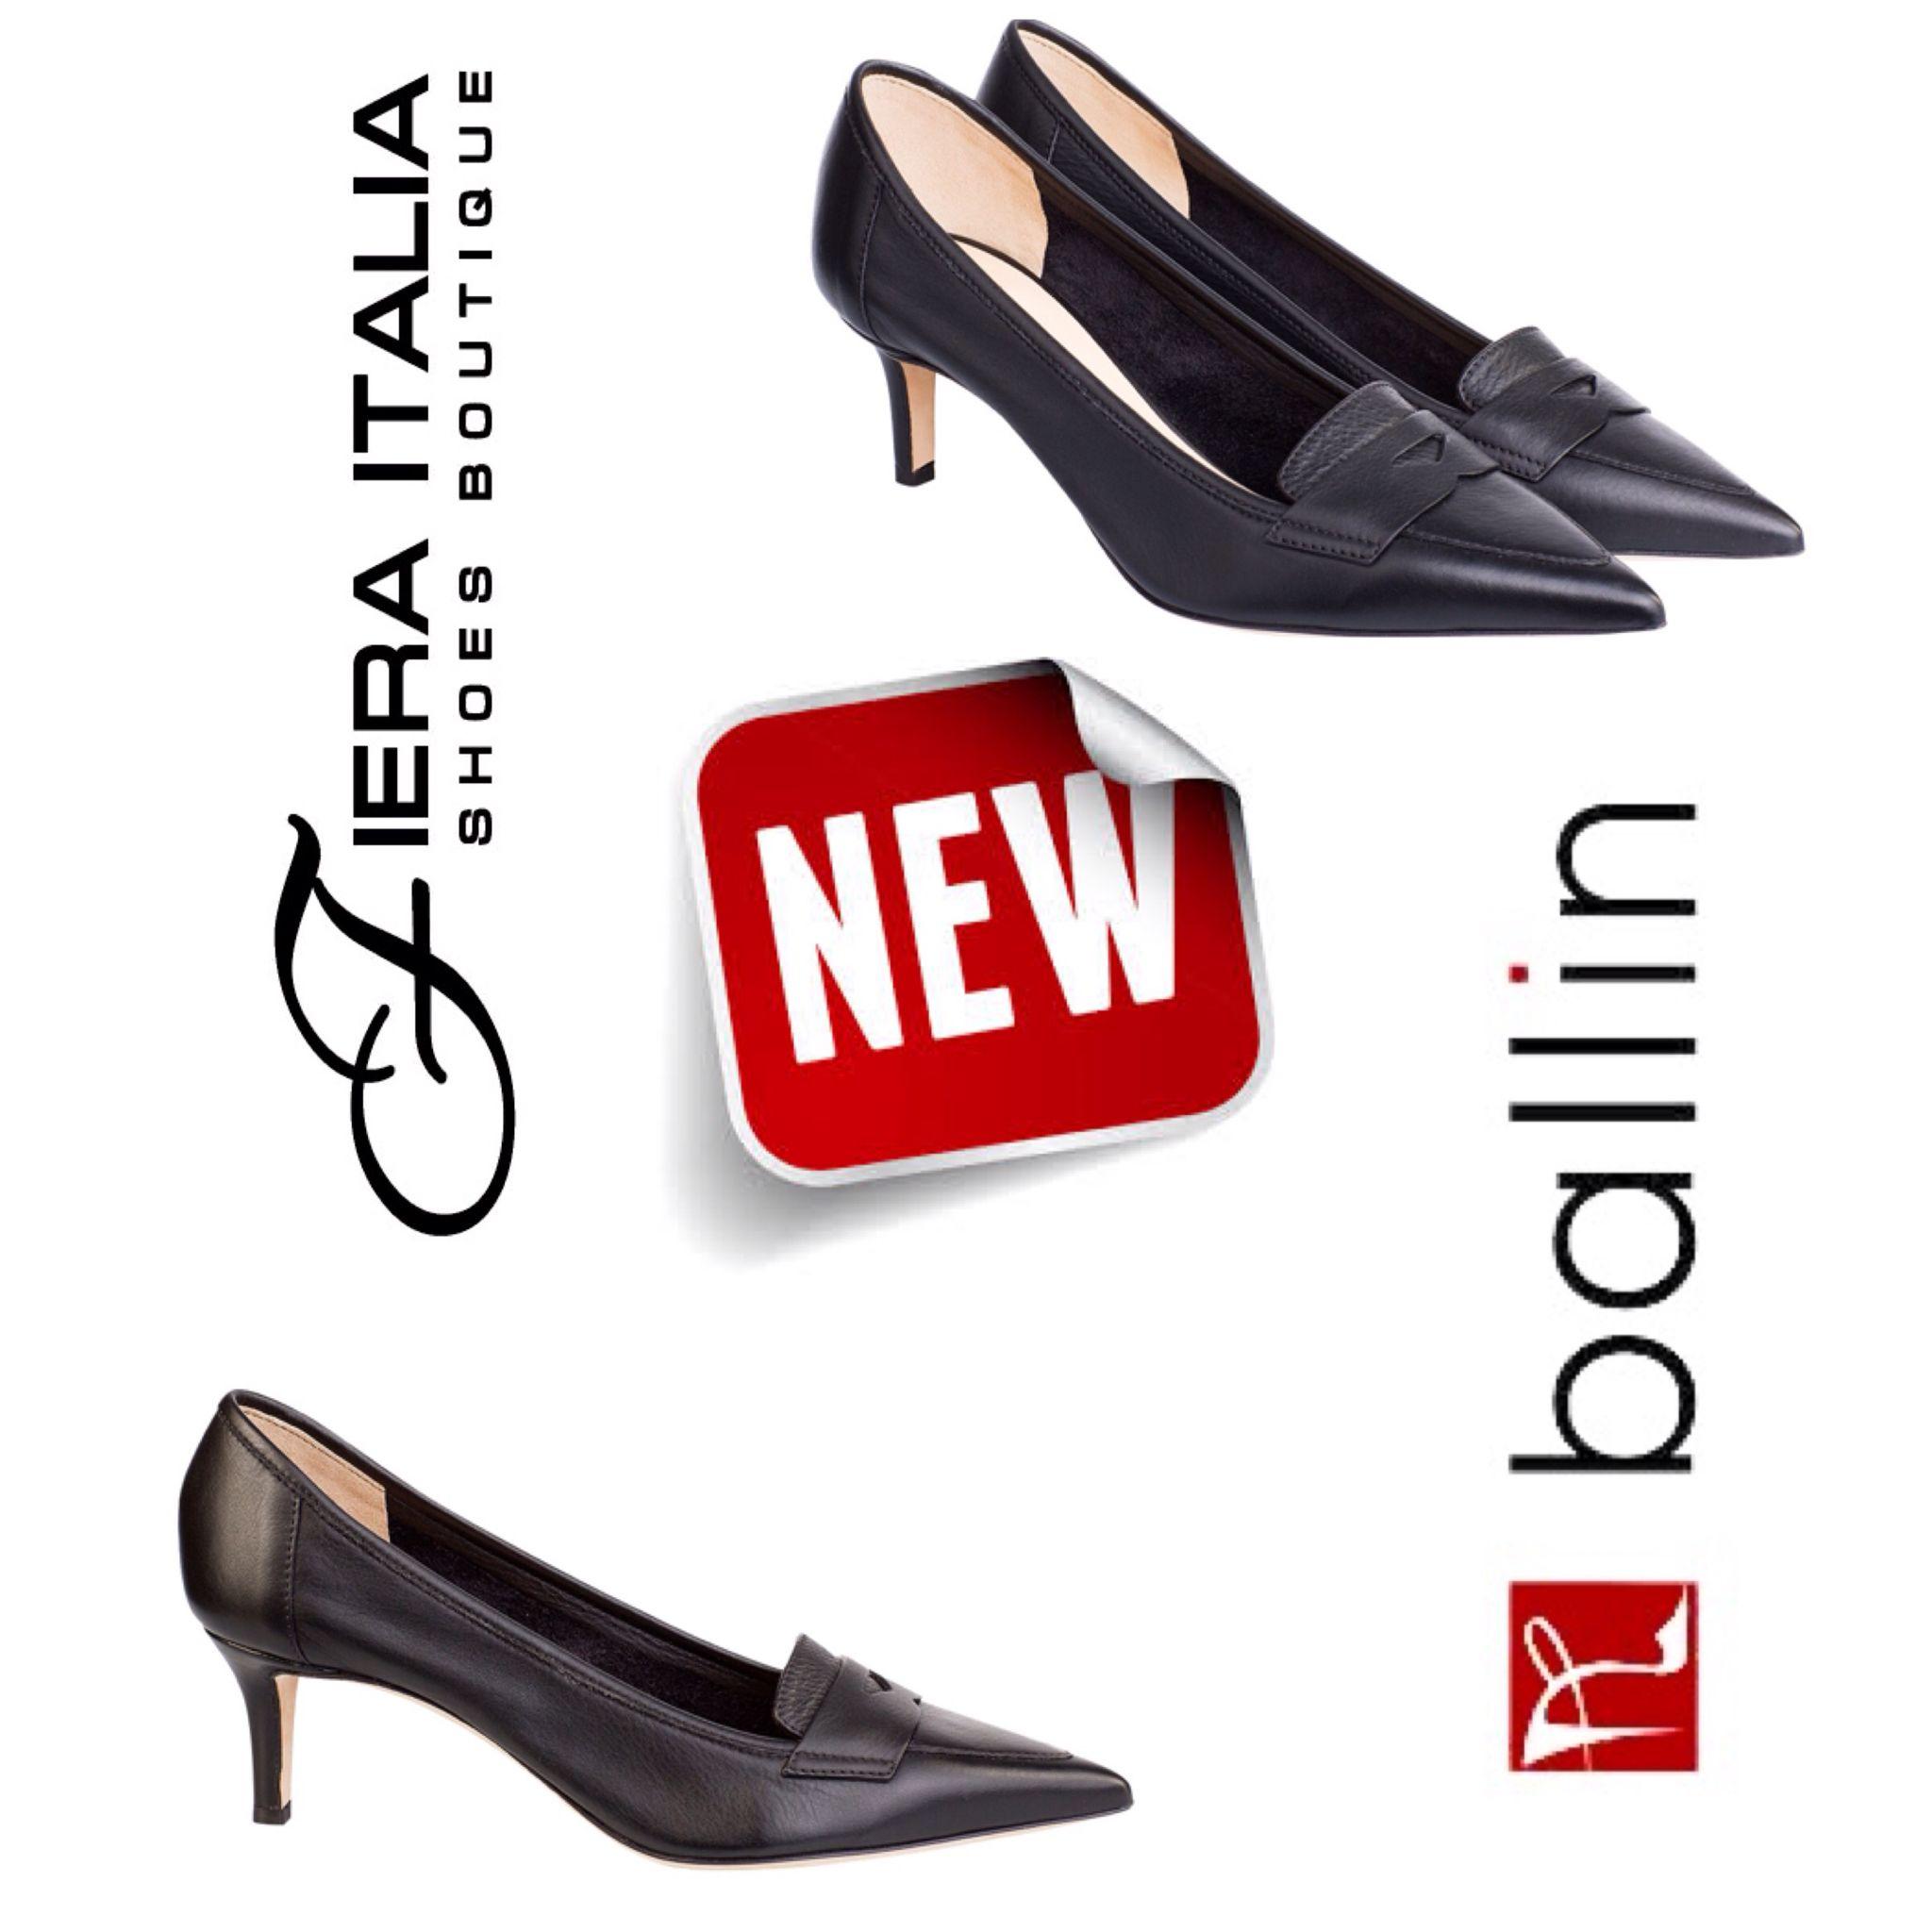 BALLIN COLLECTION FALL - WINTER 15 - 16. FIERA ITALIA. Shoes boutique.  Vaclavske namesti 28. Pasáž U STYBLU. 748adb40898